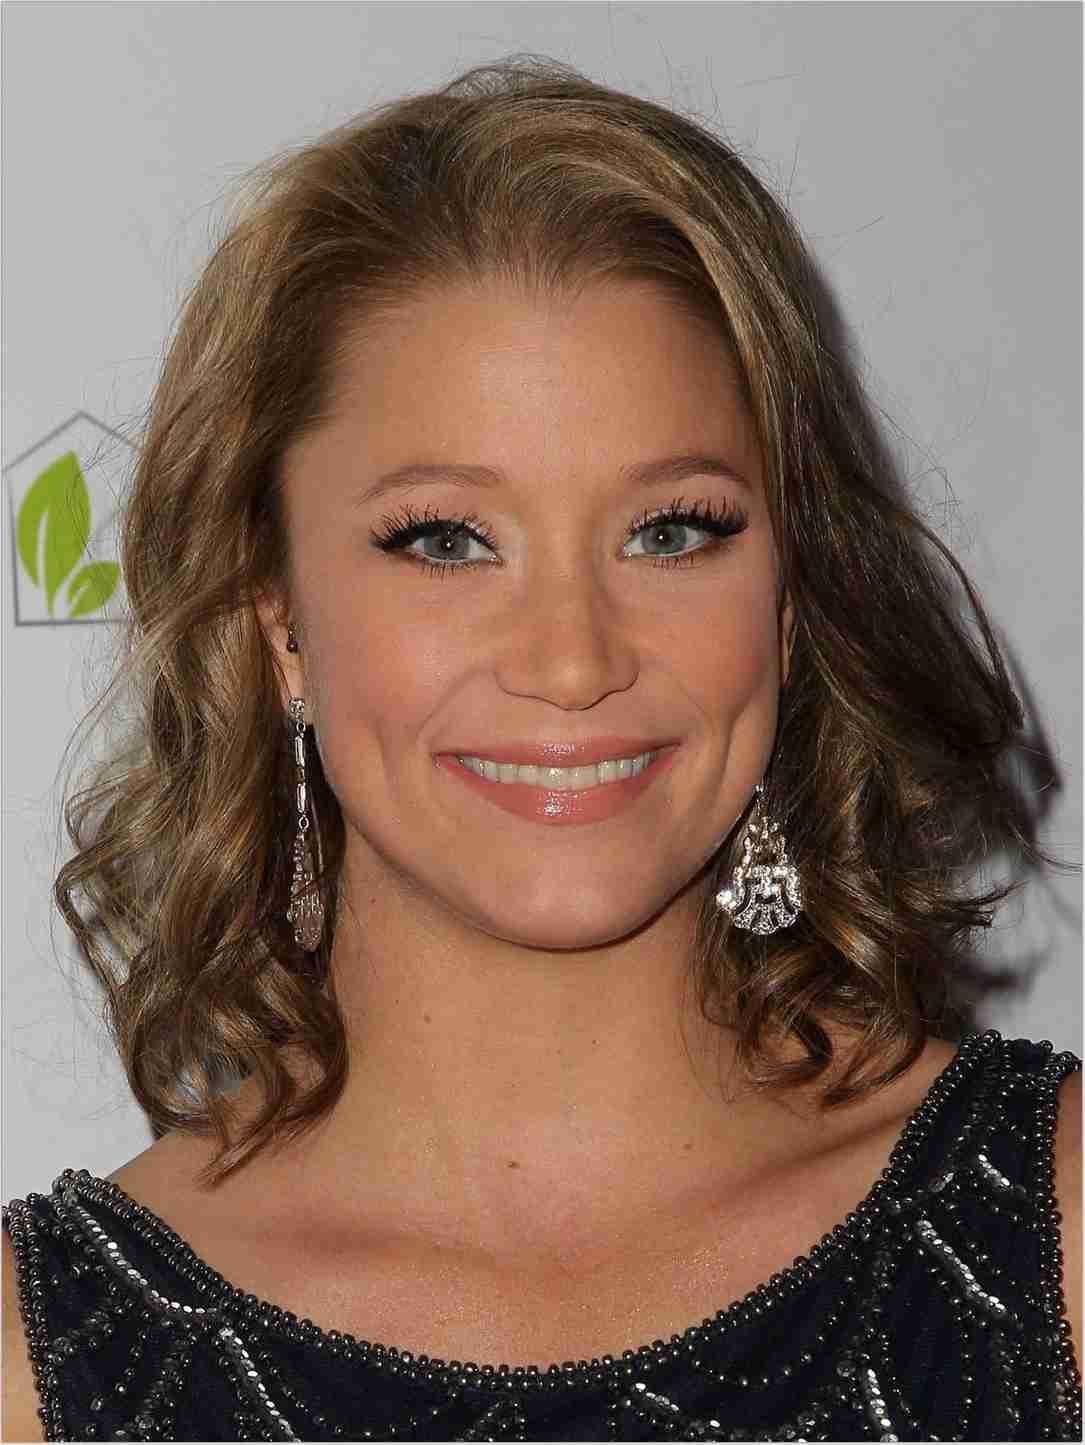 Kristen Renton Net Worth, Bio, Height, Family, Age, Weight